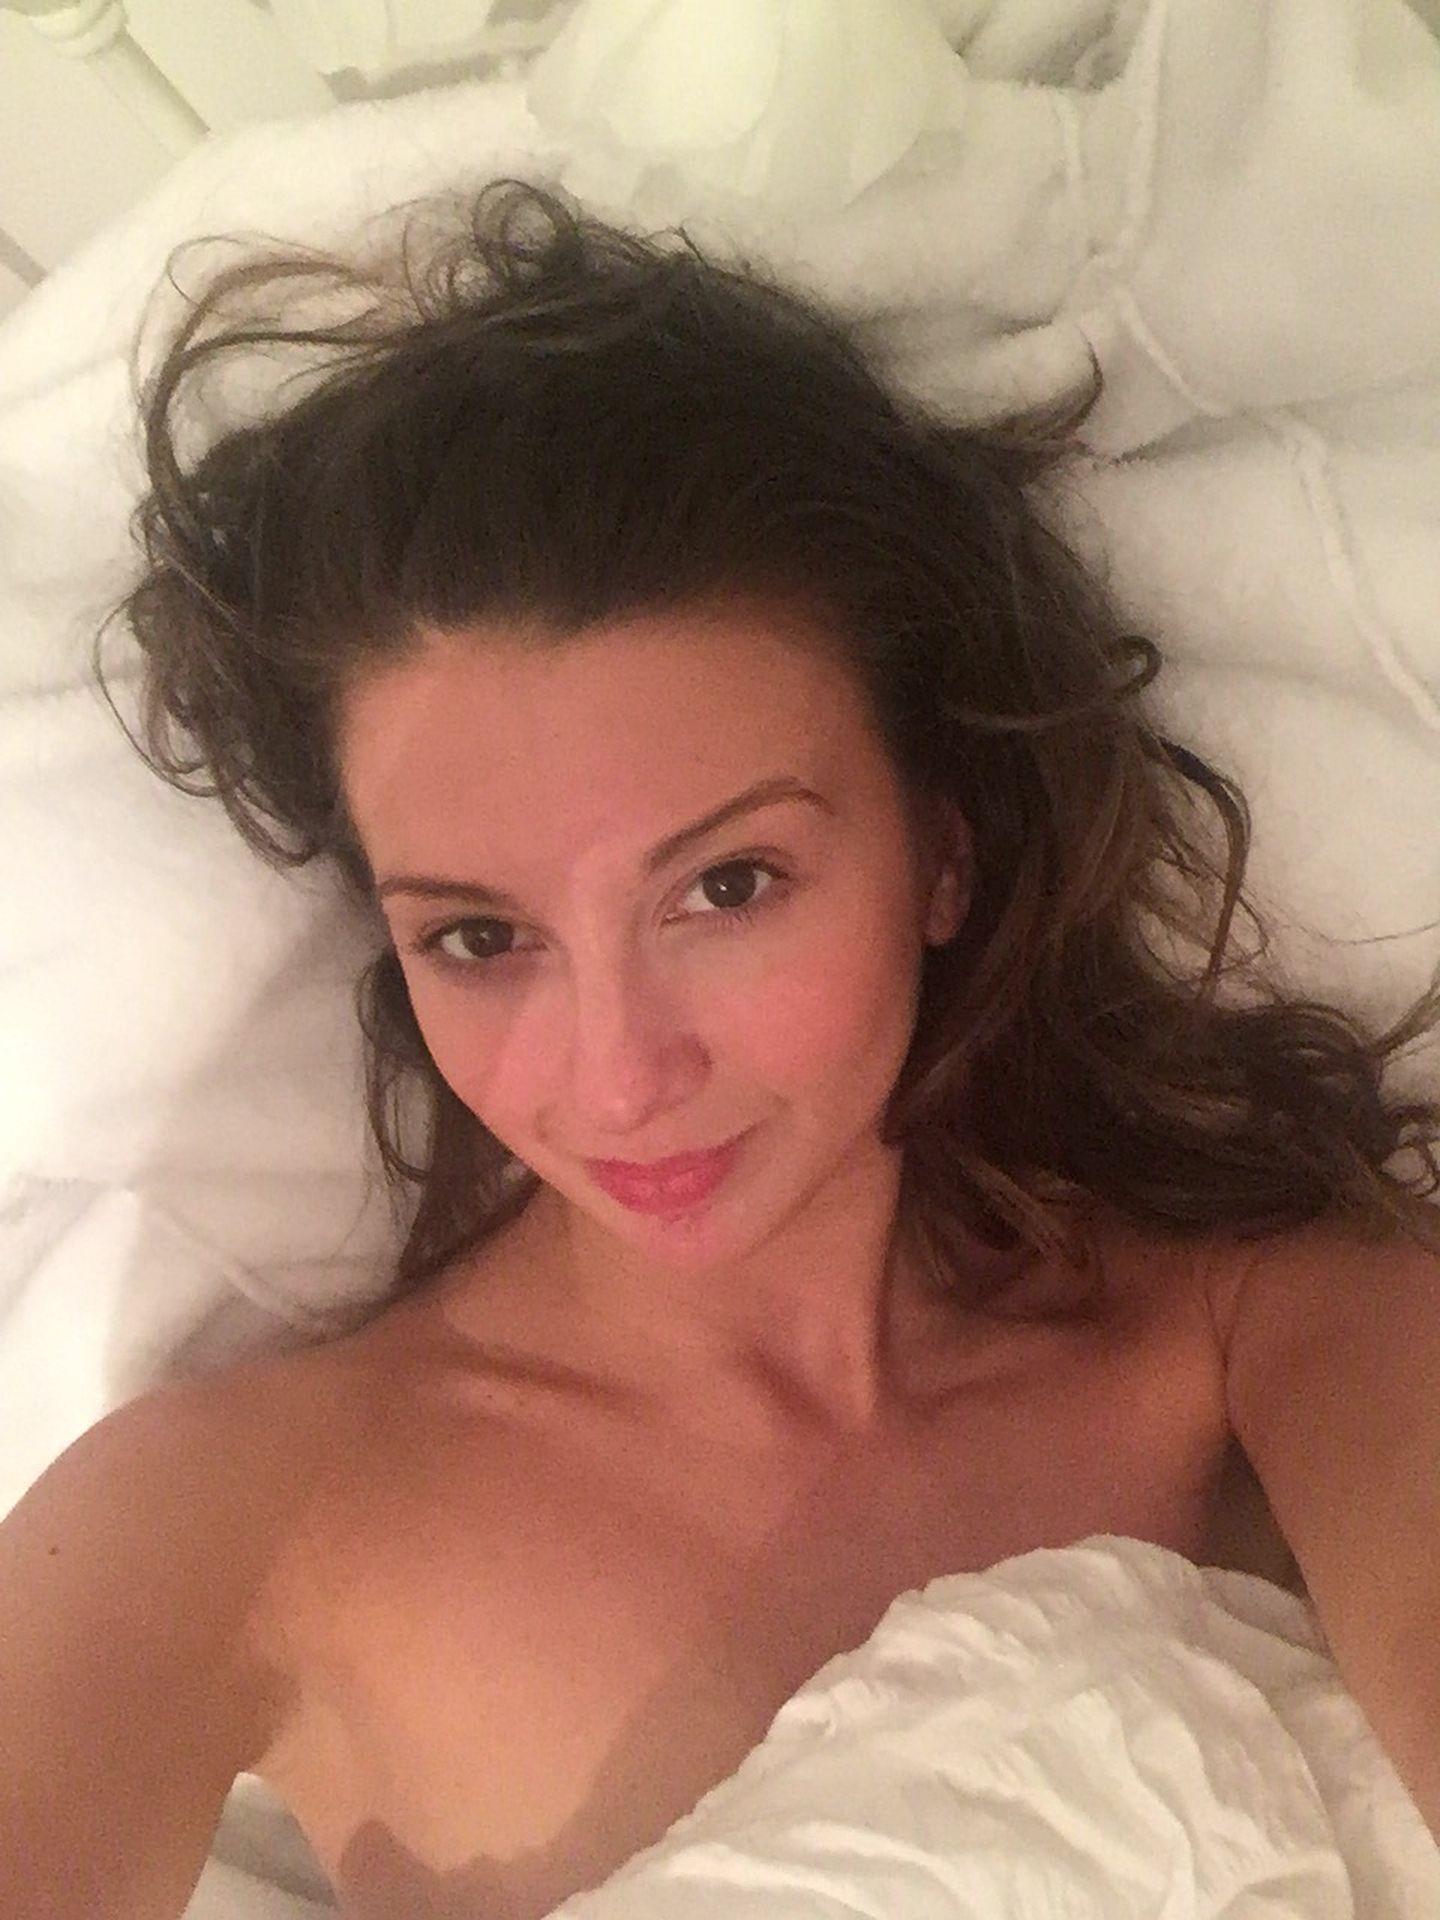 Zizi Strallen Nude Leaked The Fappening 0007